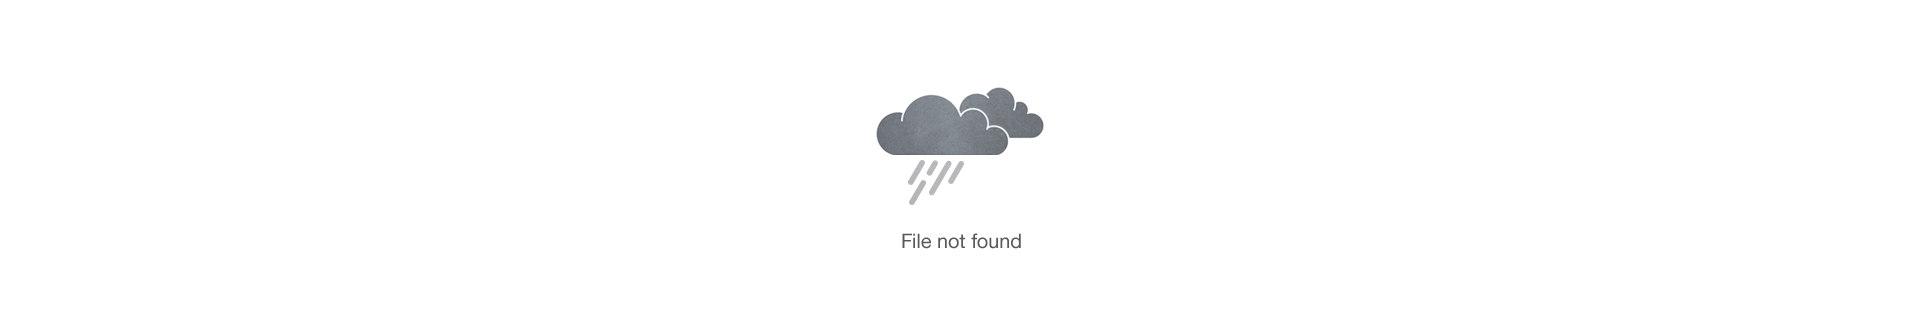 Sore Thumb - Warhammer logo